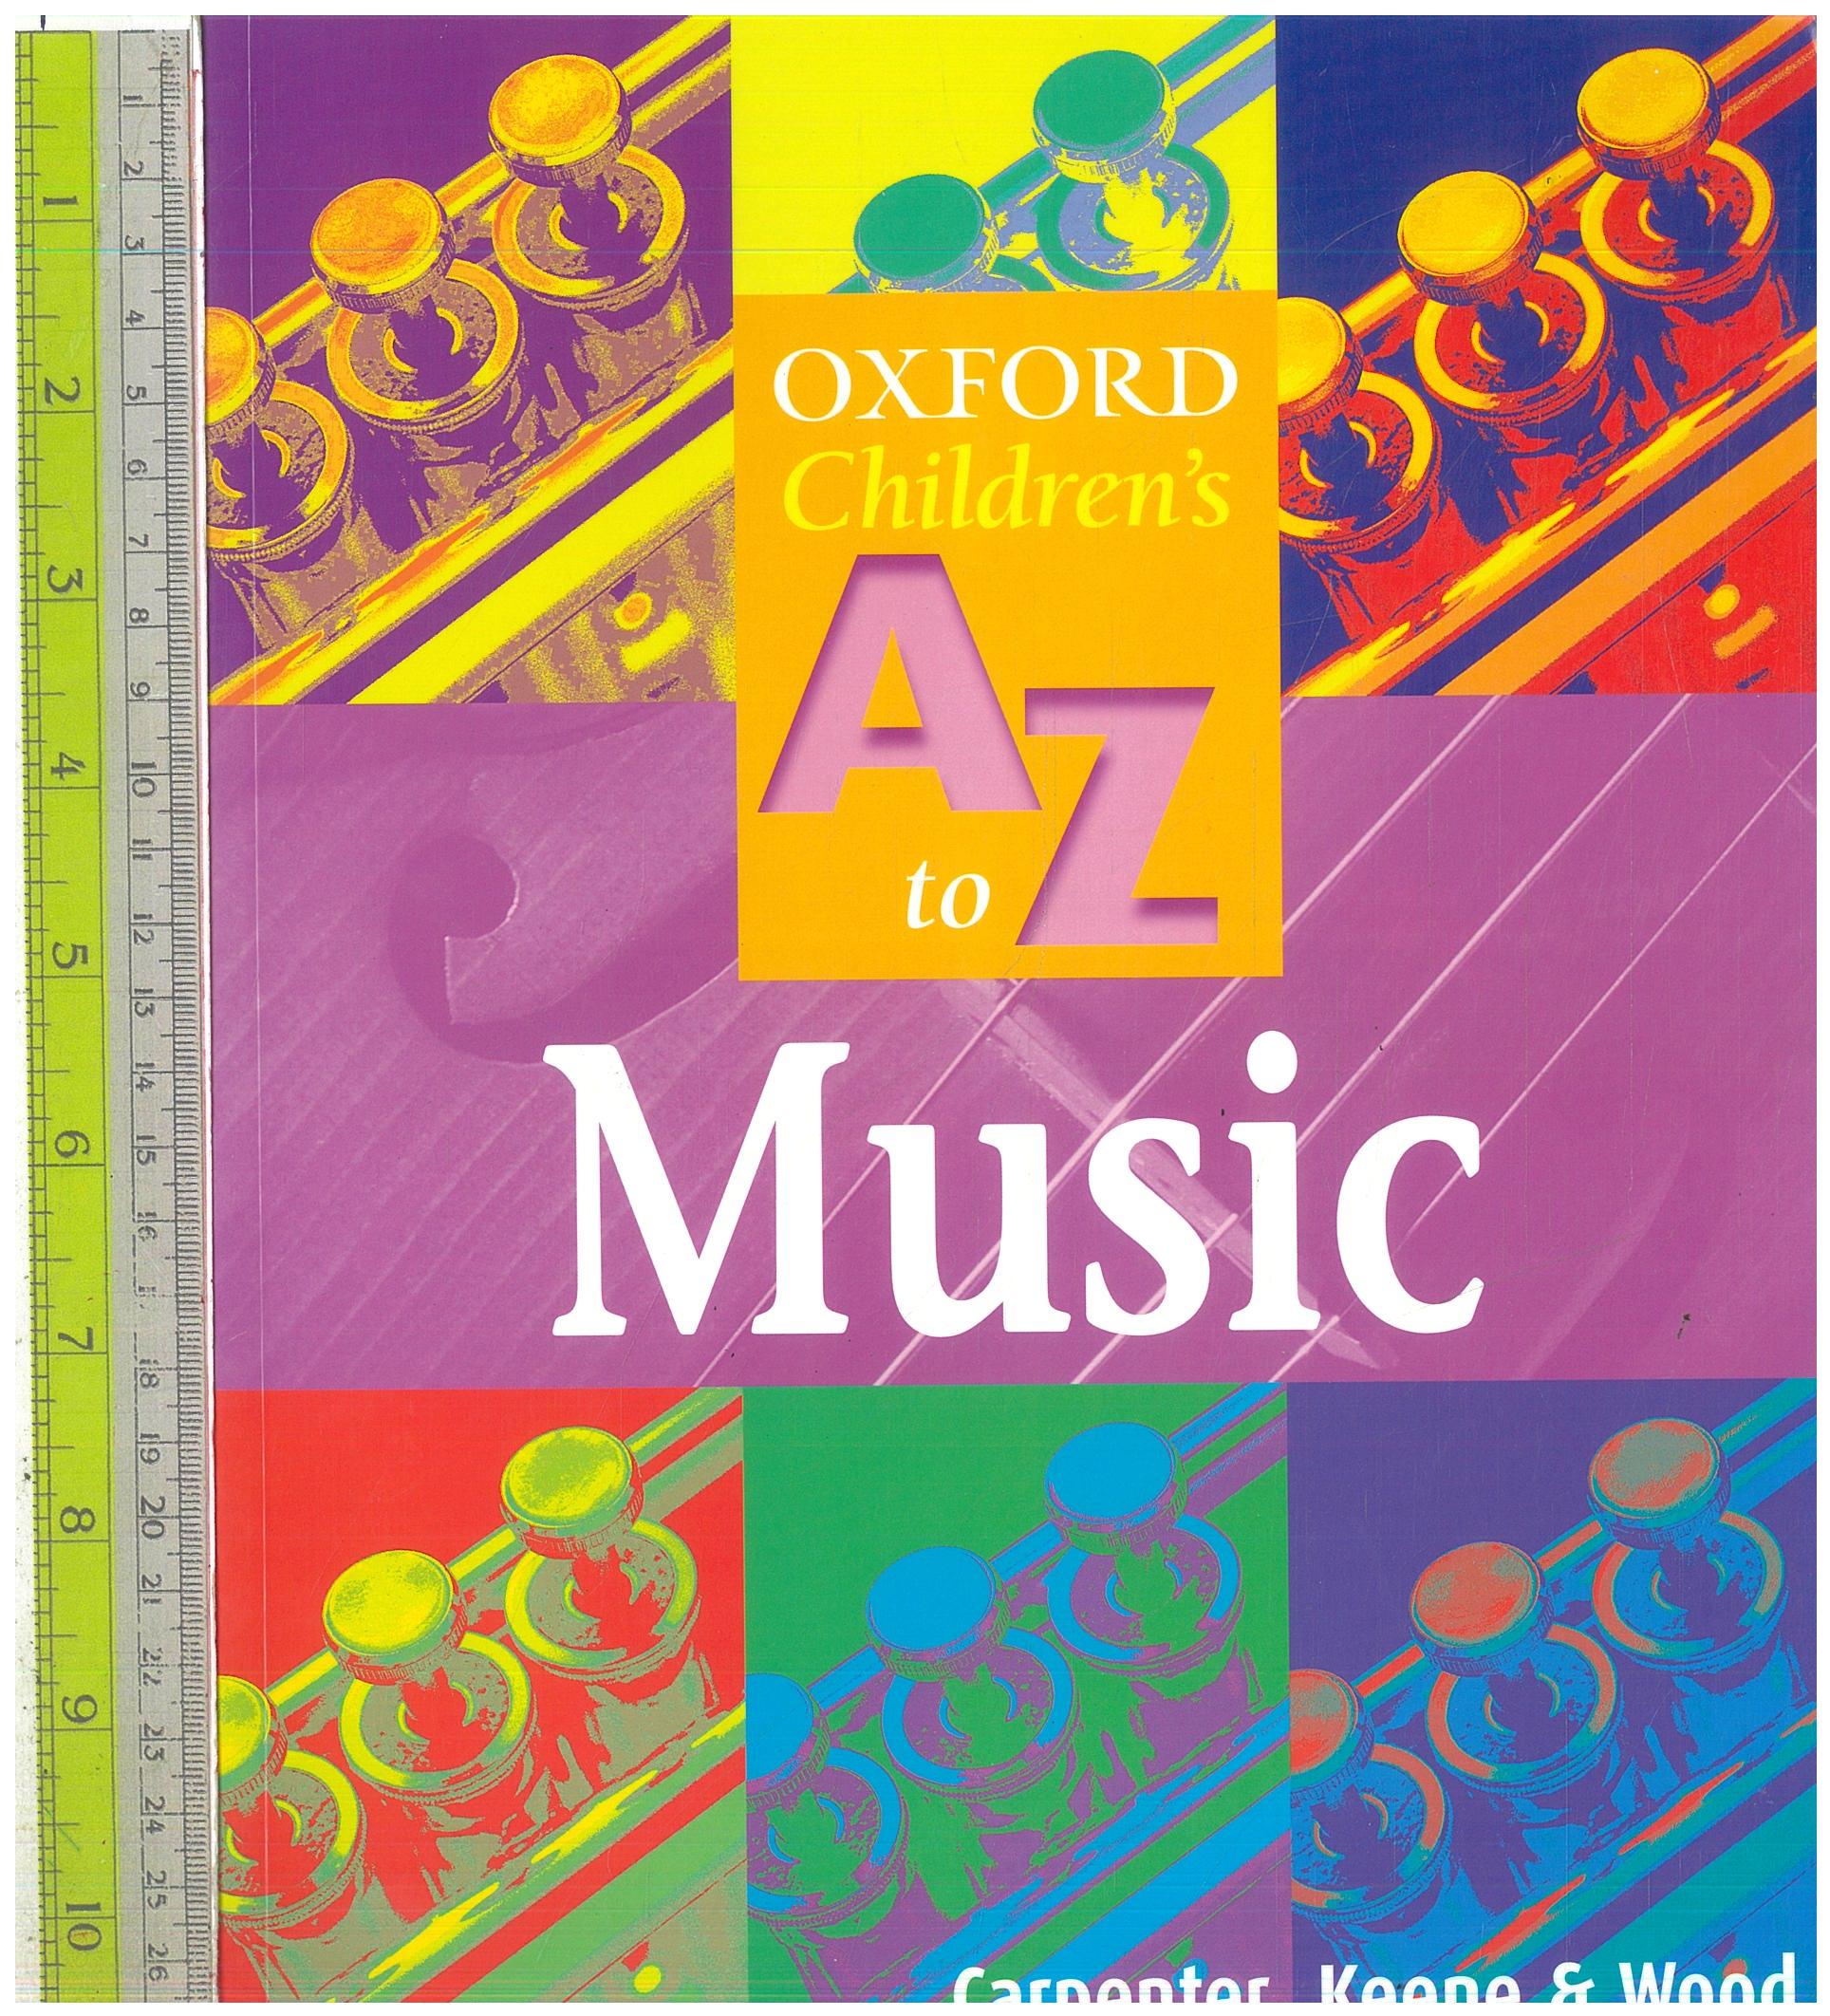 AZ to Music